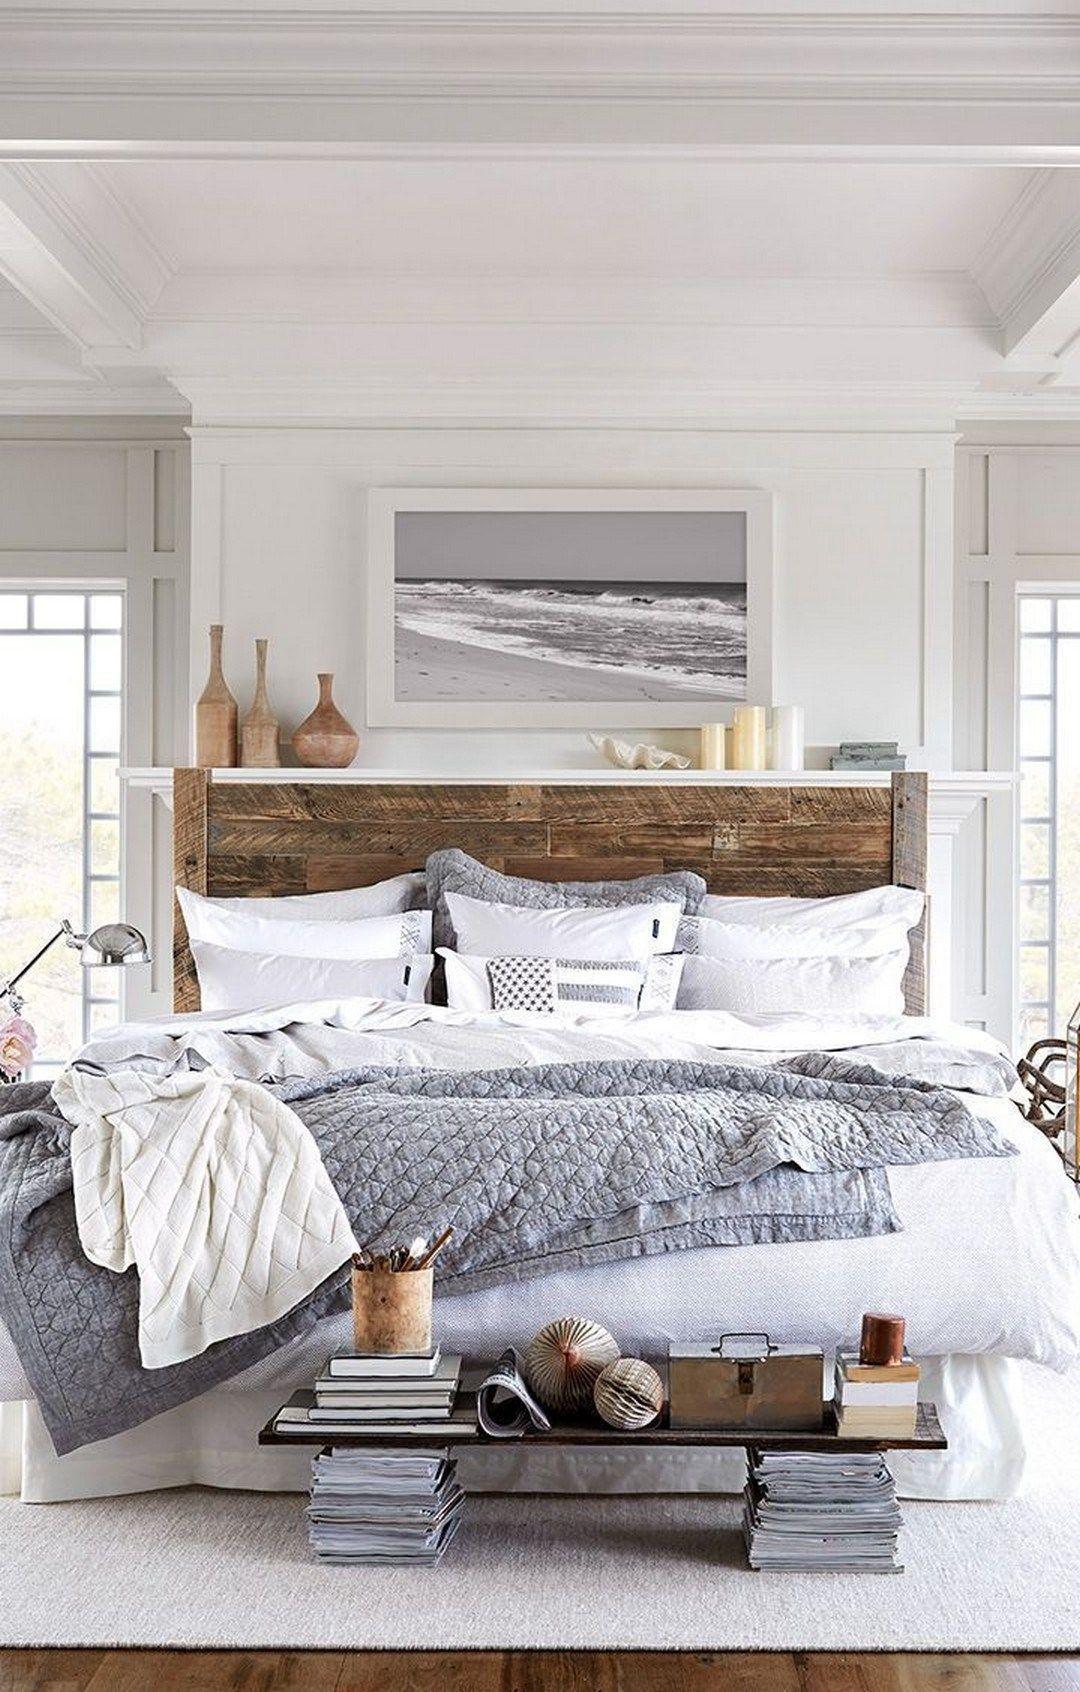 Bedroom decorating master bedroom ideas   Beautiful Master Bedroom Decorating Ideas   Furniture ideas